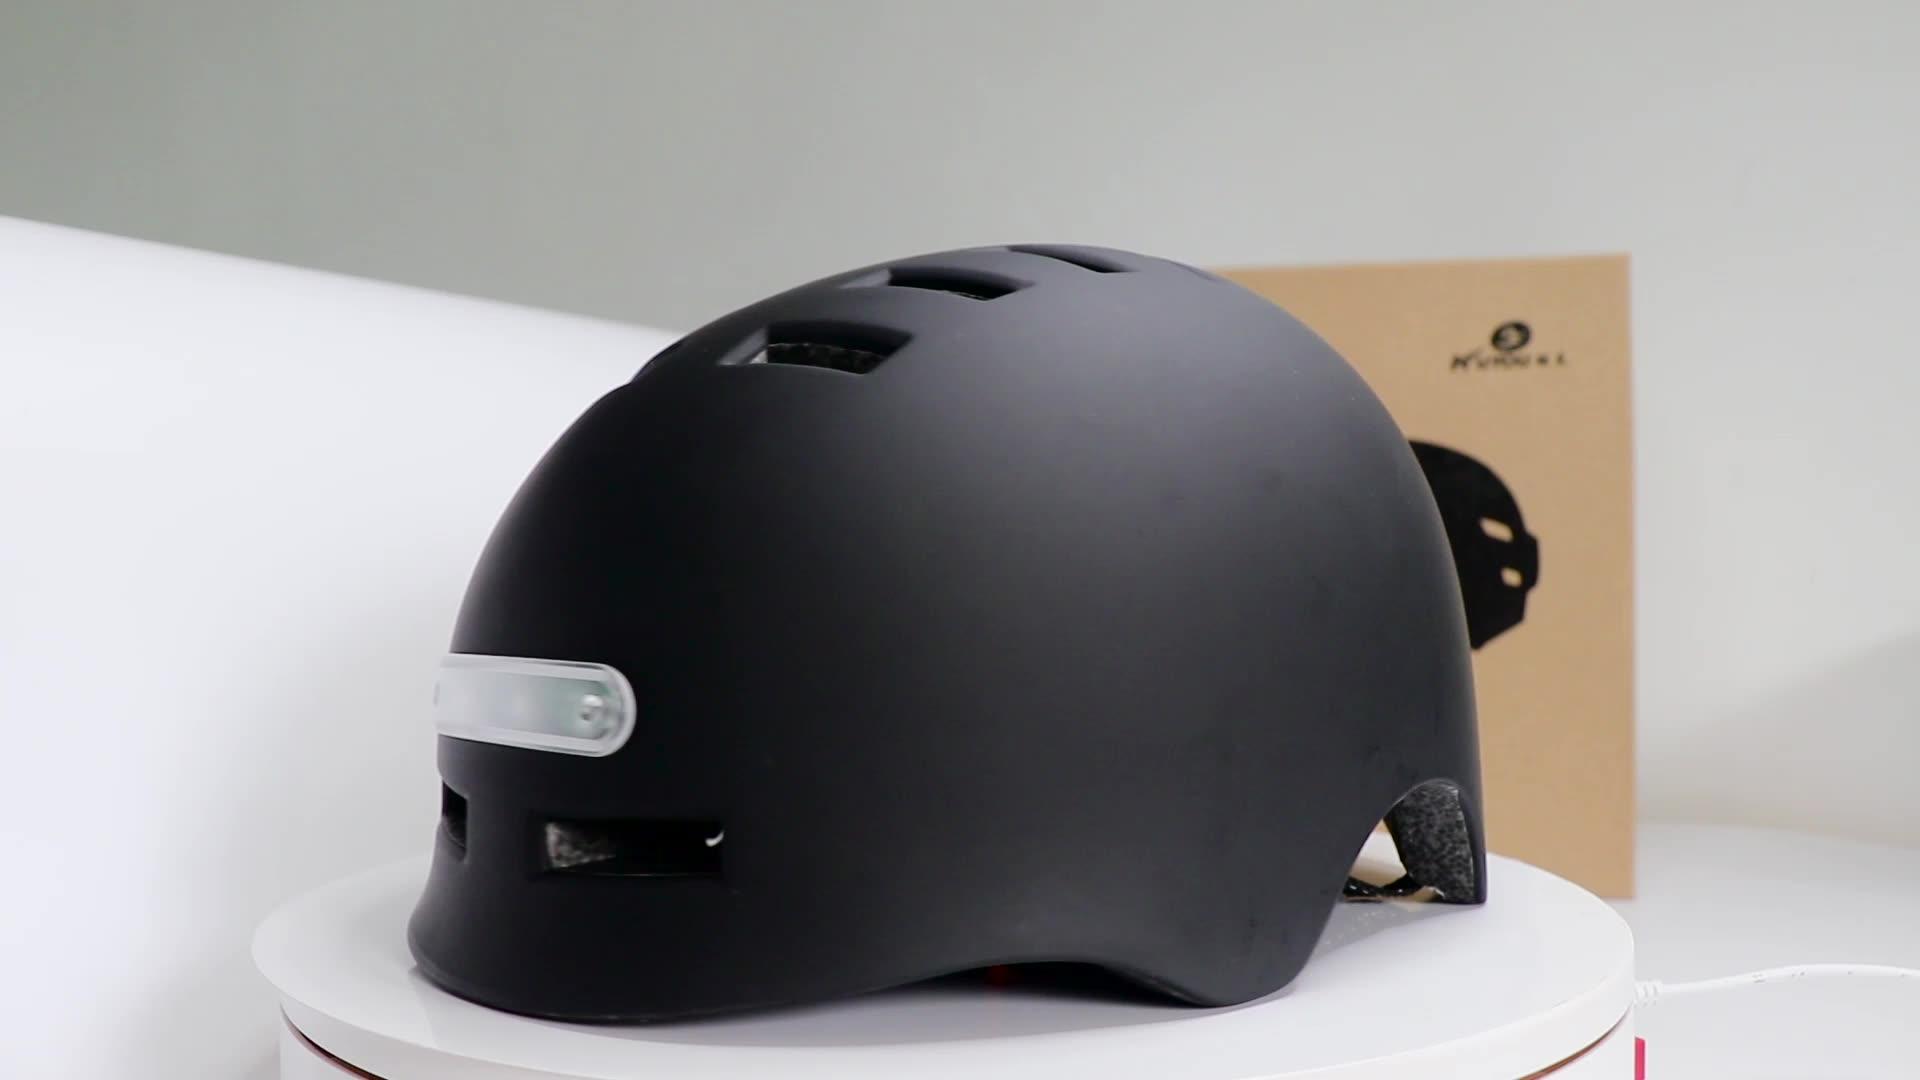 Cycling Bicycle Helmet MTB Road Bikes Helmets Warning Light Flash Headlight Safety Helmet for Adult Kids Night Riding Protect